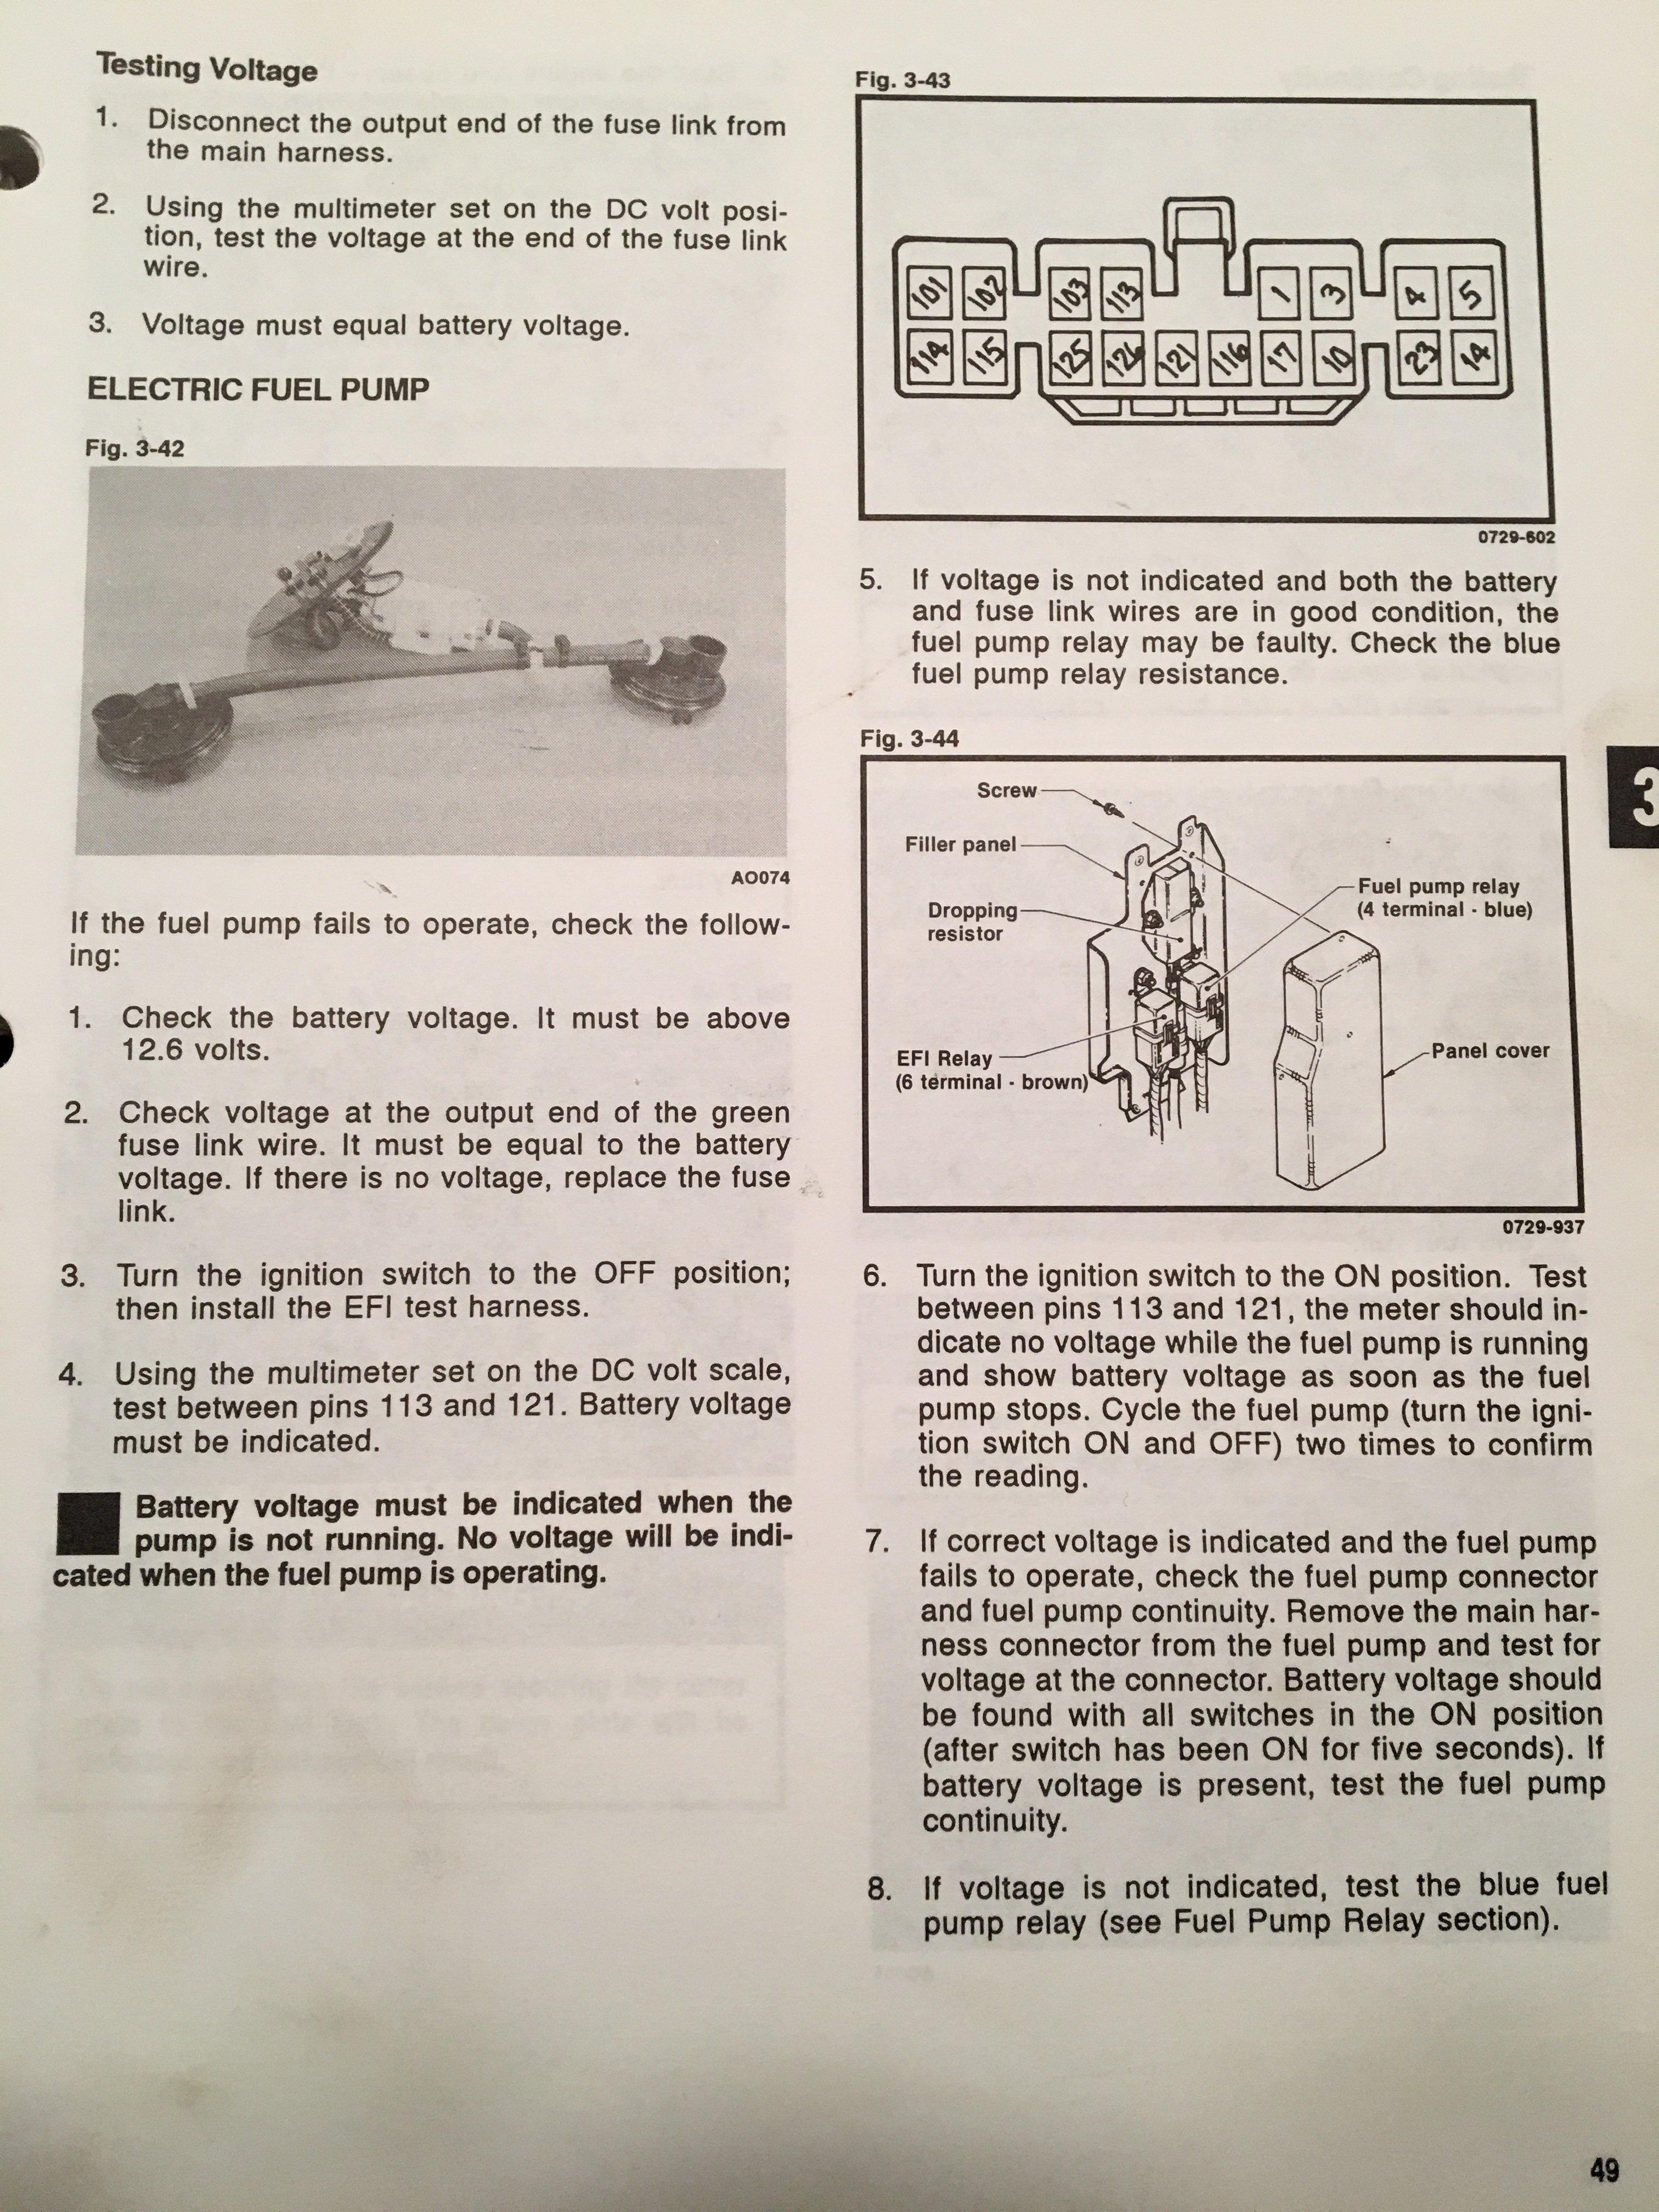 94 Pantera Repair Manual?-img_0295.jpg